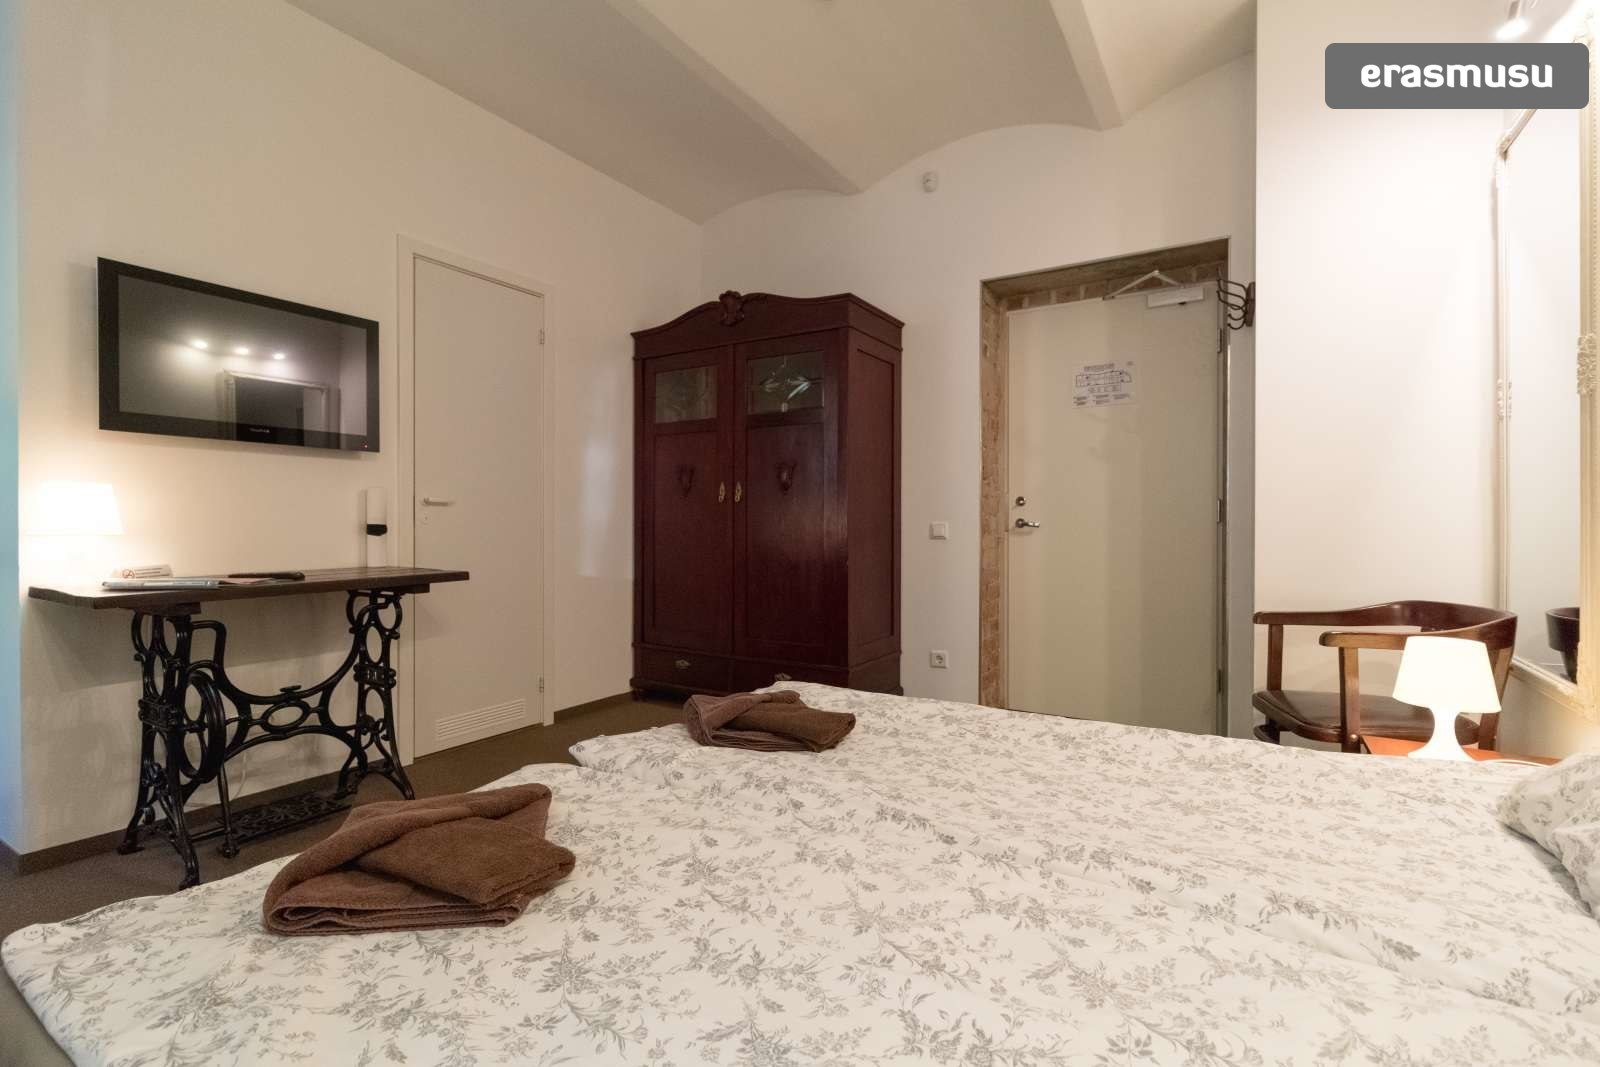 spacious-ensuite-room-kitchenette-rent-agenskalns-4e1be3e214b53e